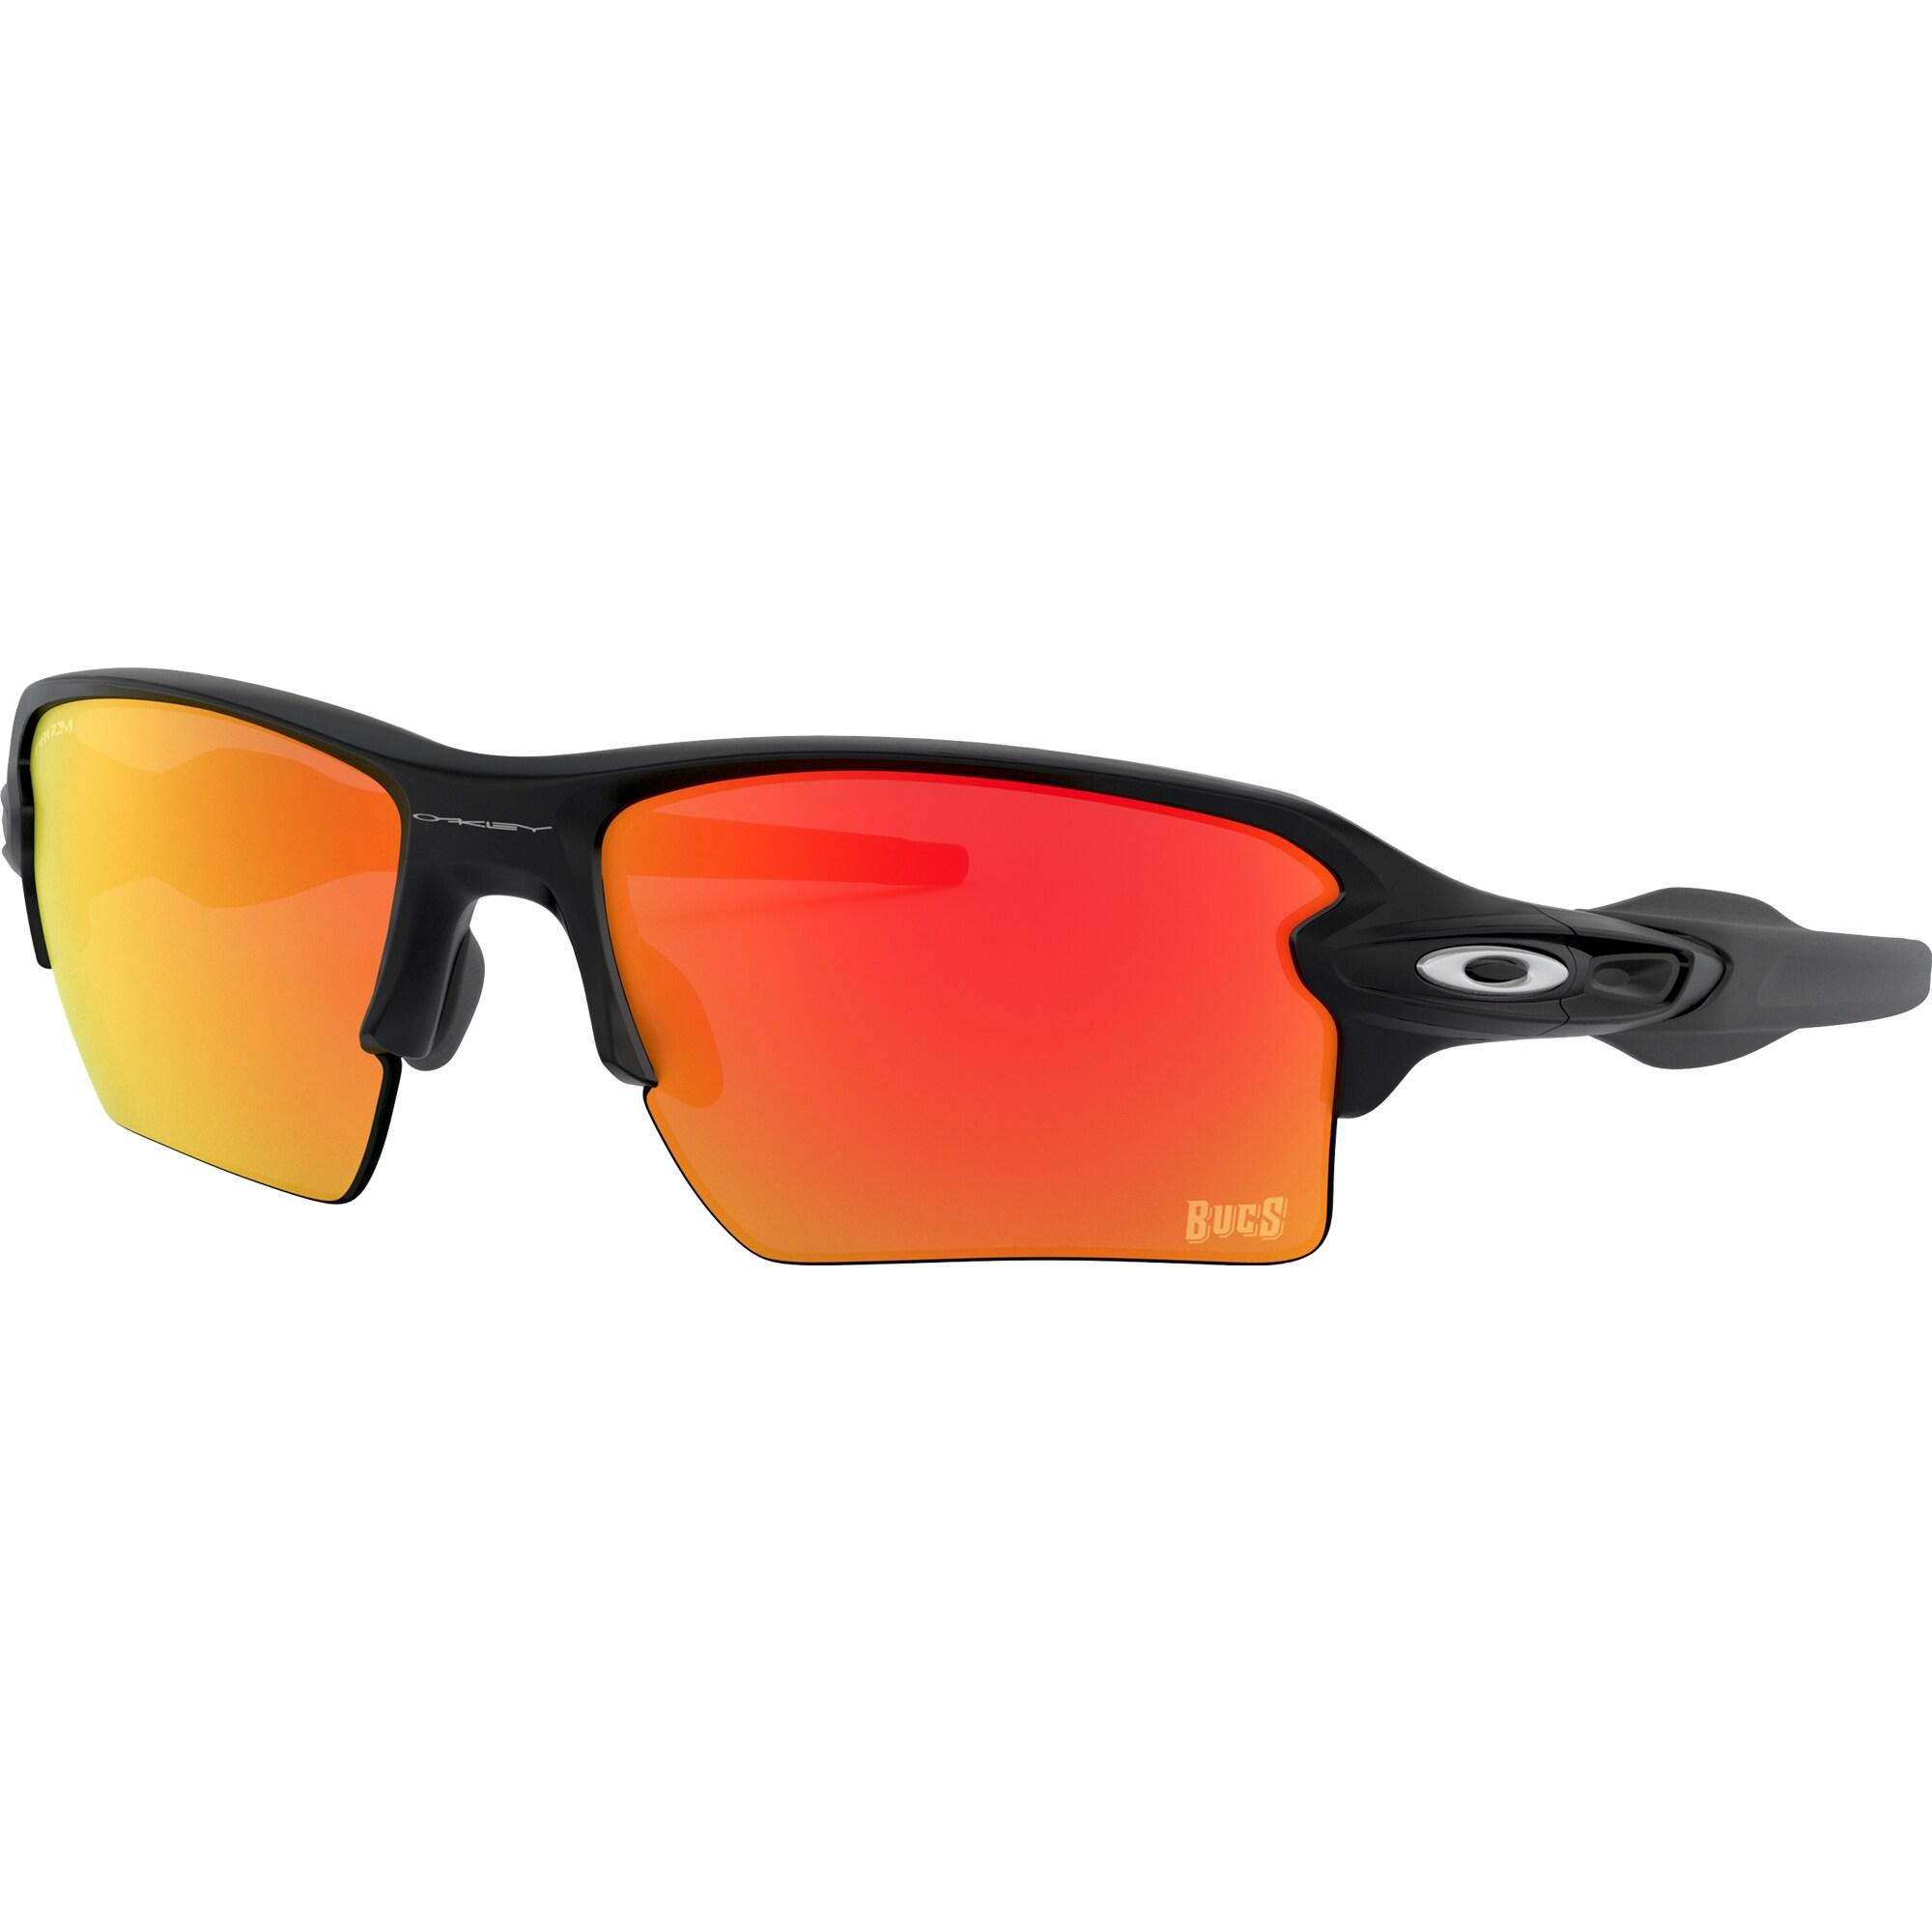 Tampa Bay Buccaneers Oakley Flak 2.0 XL Sunglasses